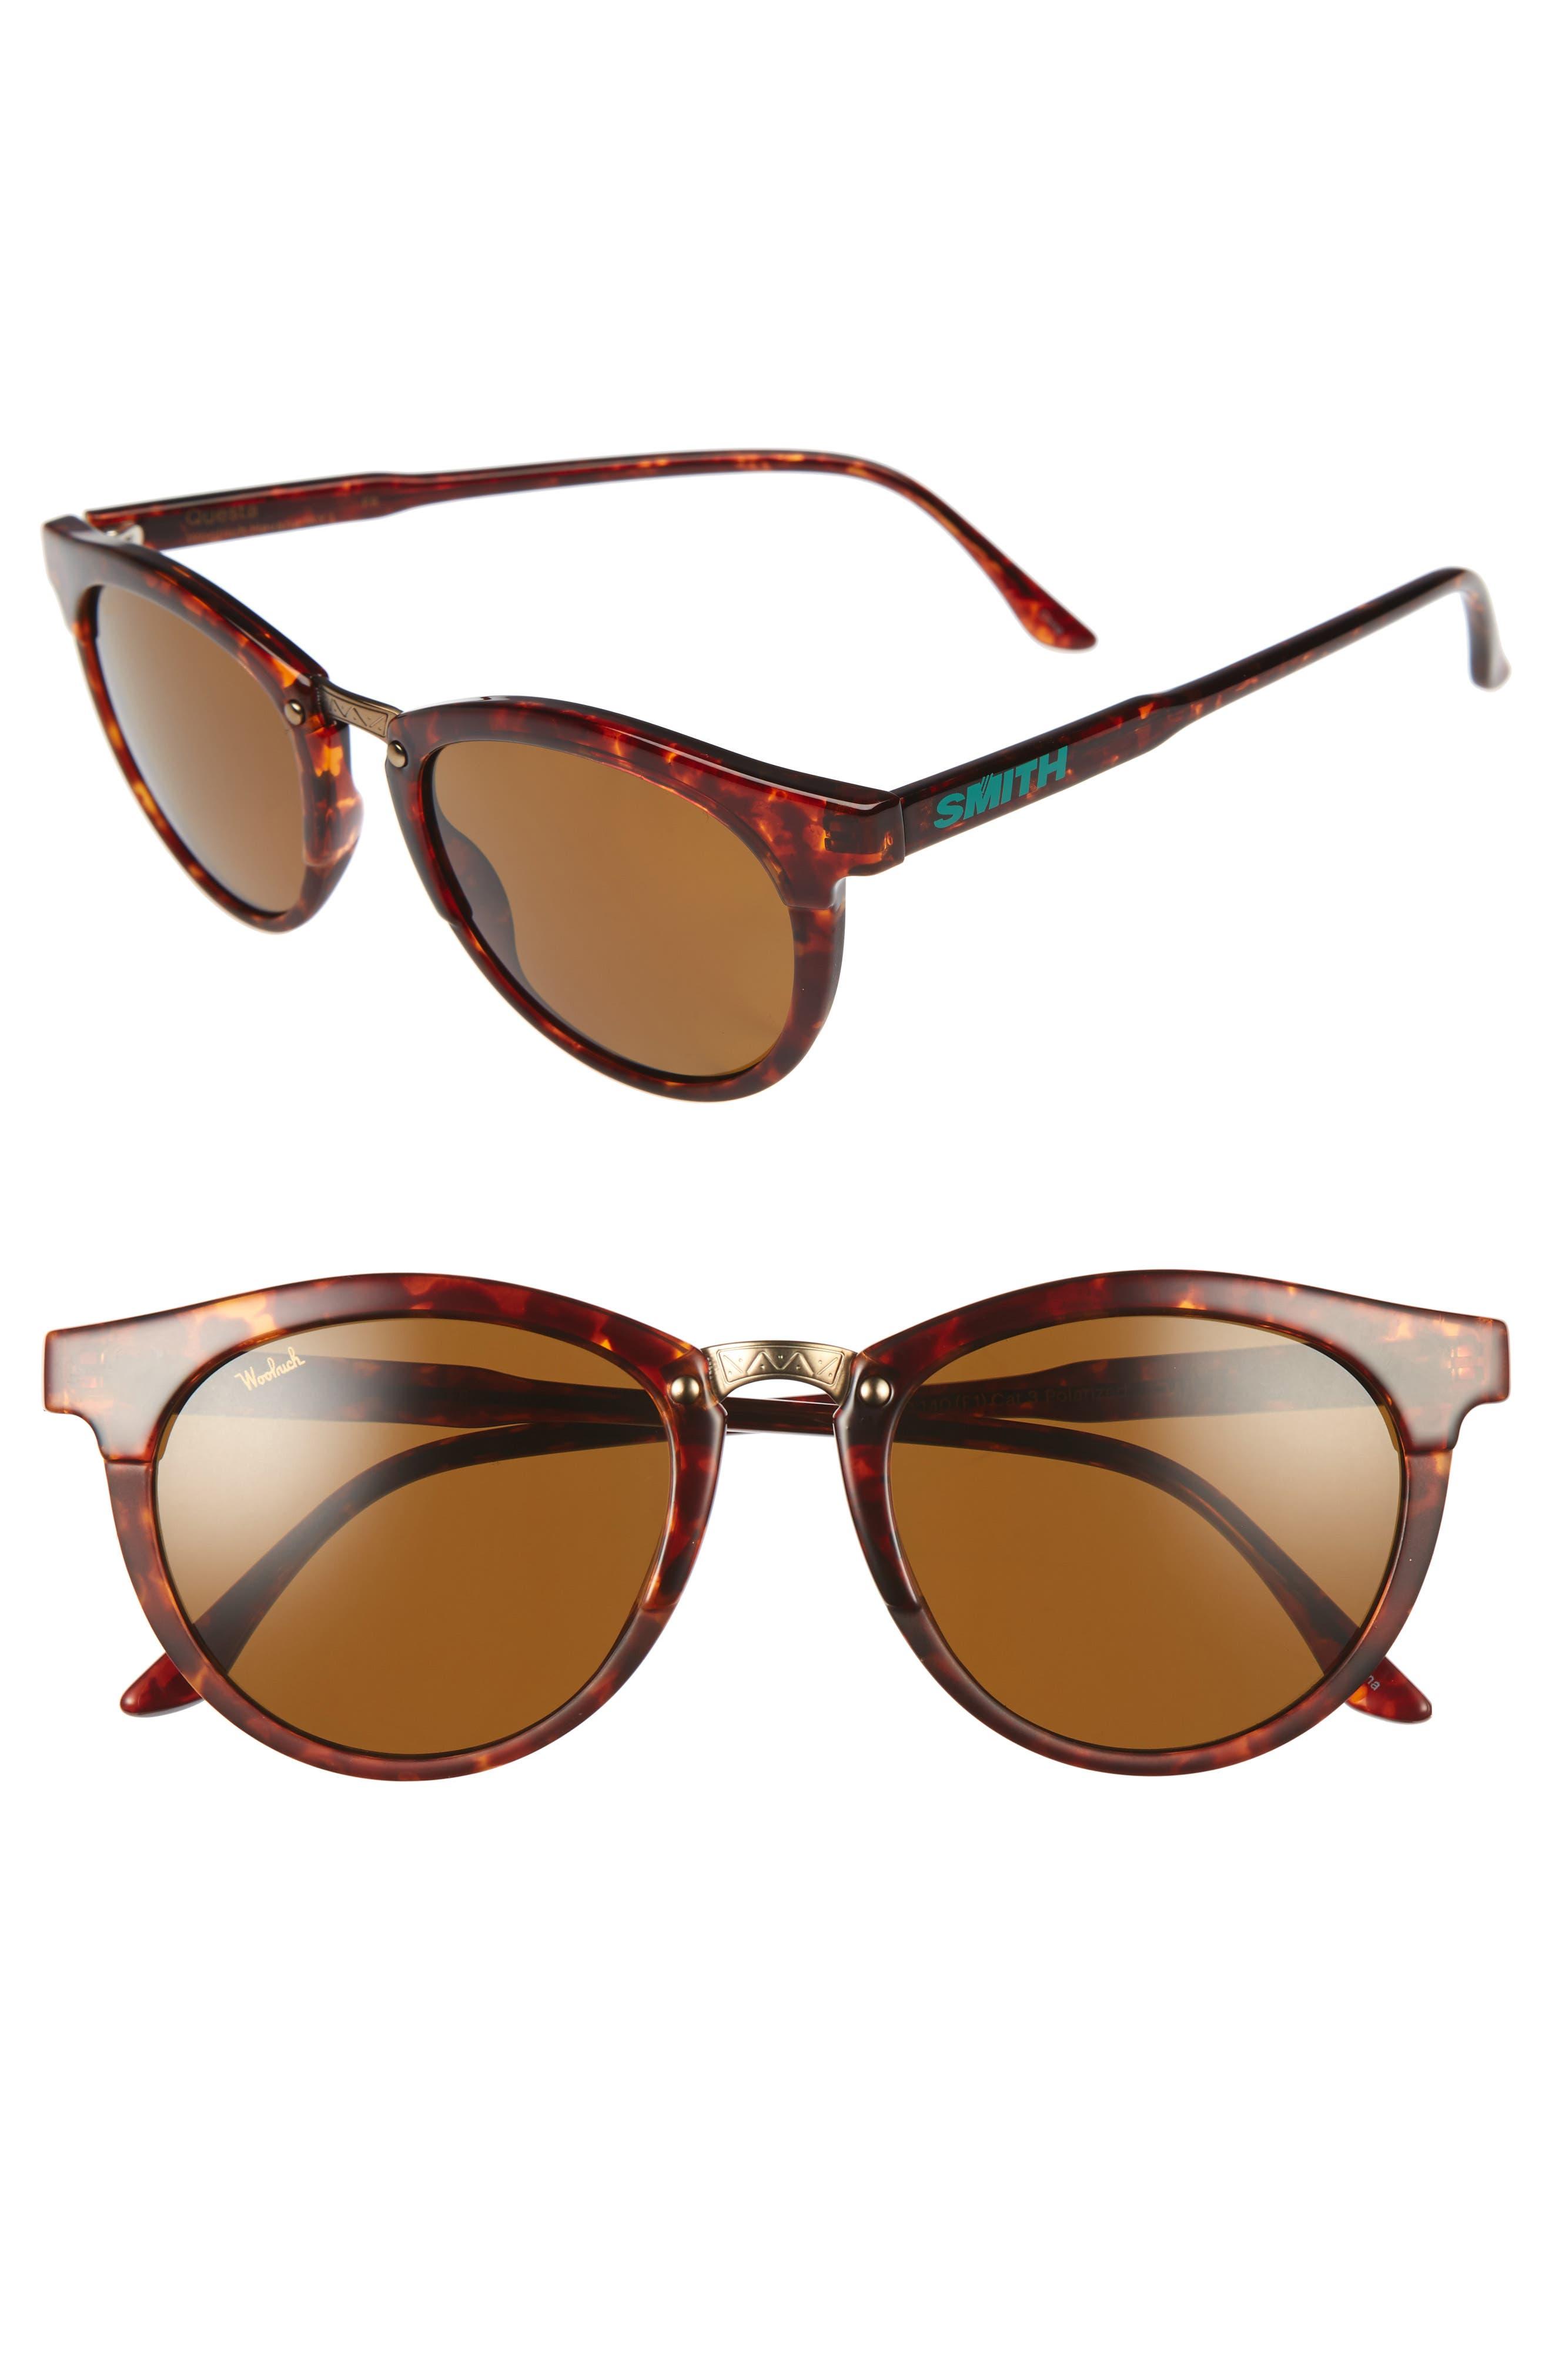 Alternate Image 1 Selected - Smith Questa 49mm Polarized Sunglasses